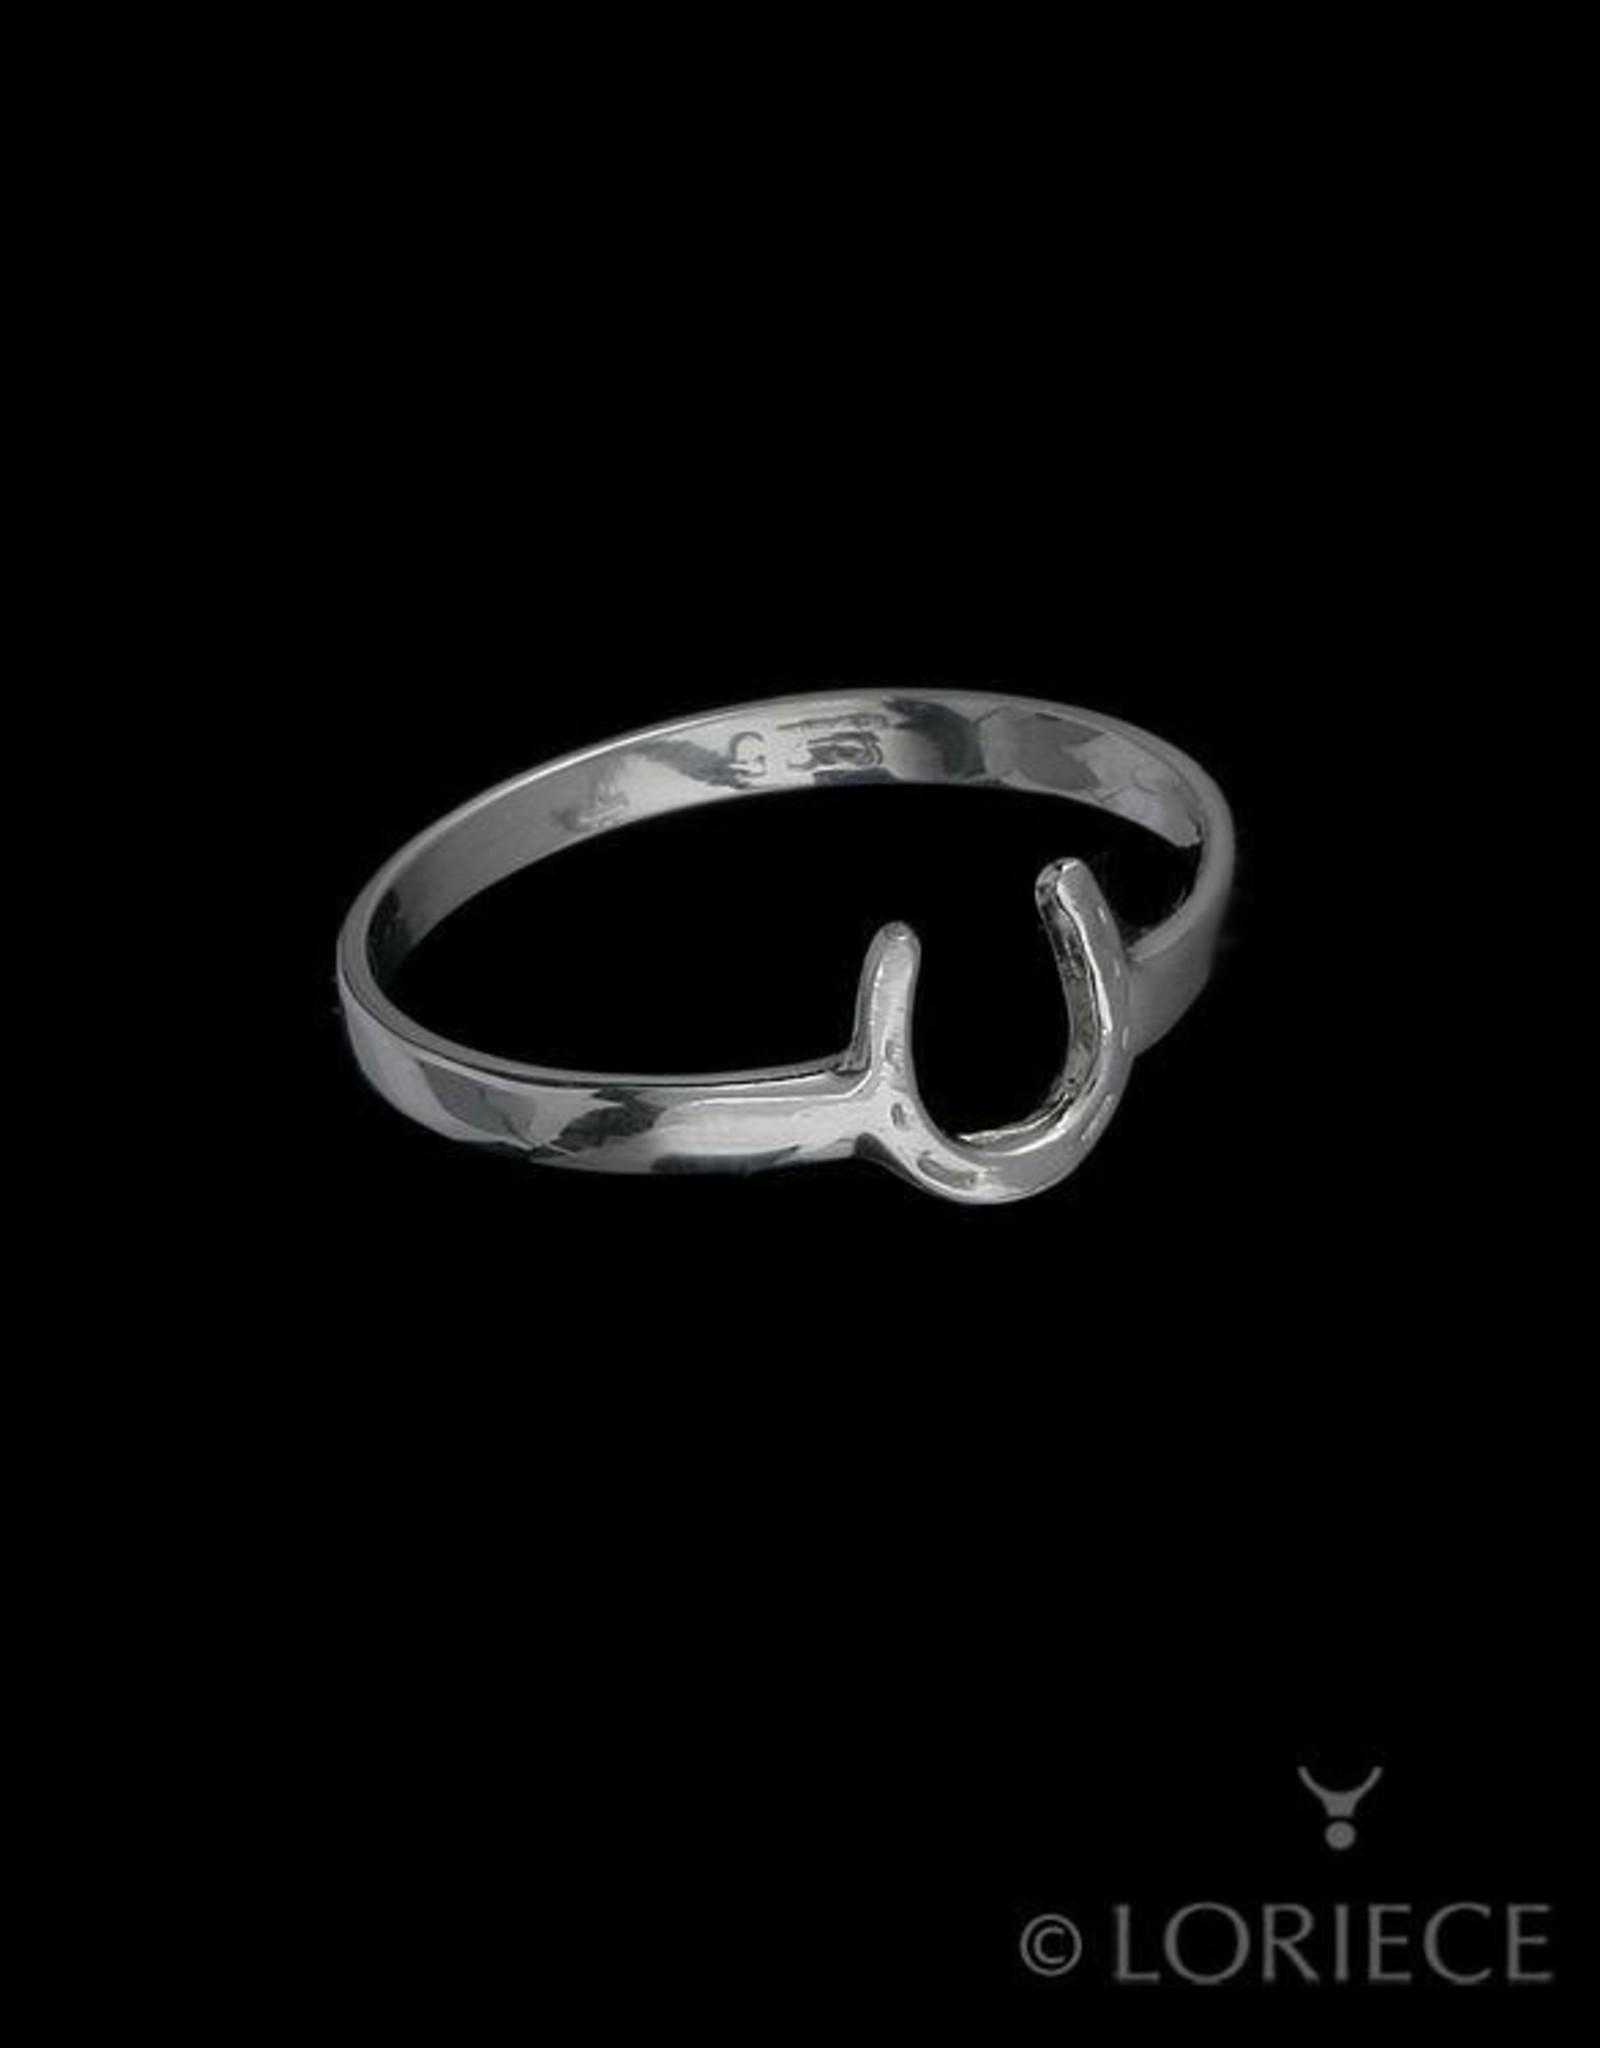 Tiny Horseshoe Ring by Loriece